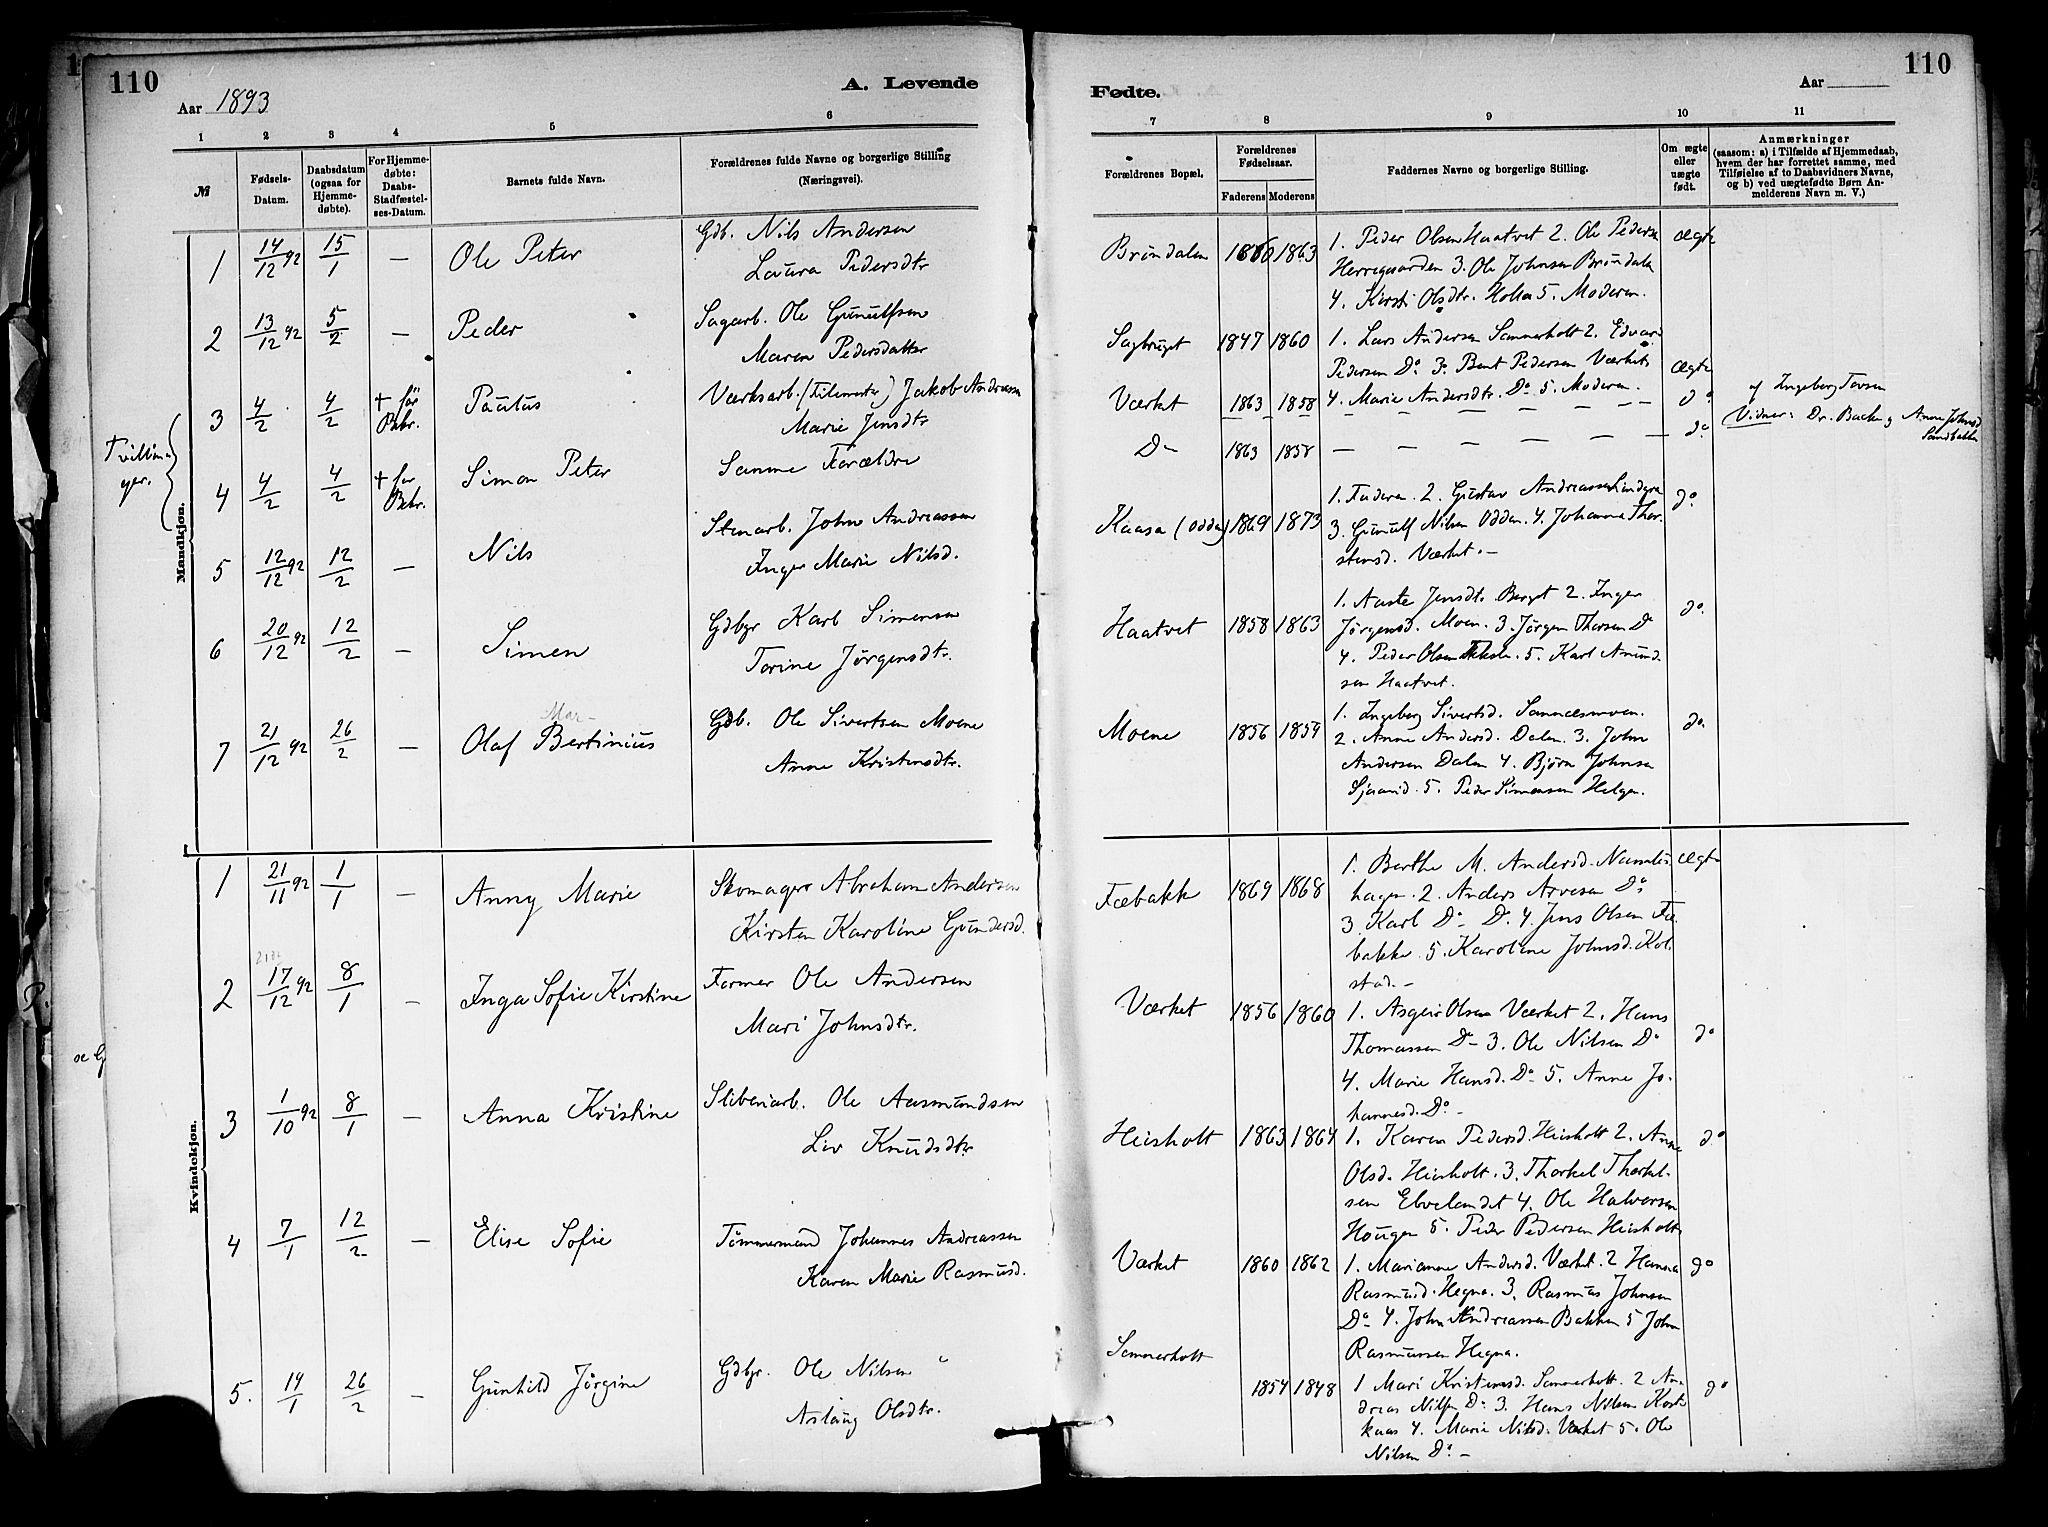 SAKO, Holla kirkebøker, F/Fa/L0008: Ministerialbok nr. 8, 1882-1897, s. 110